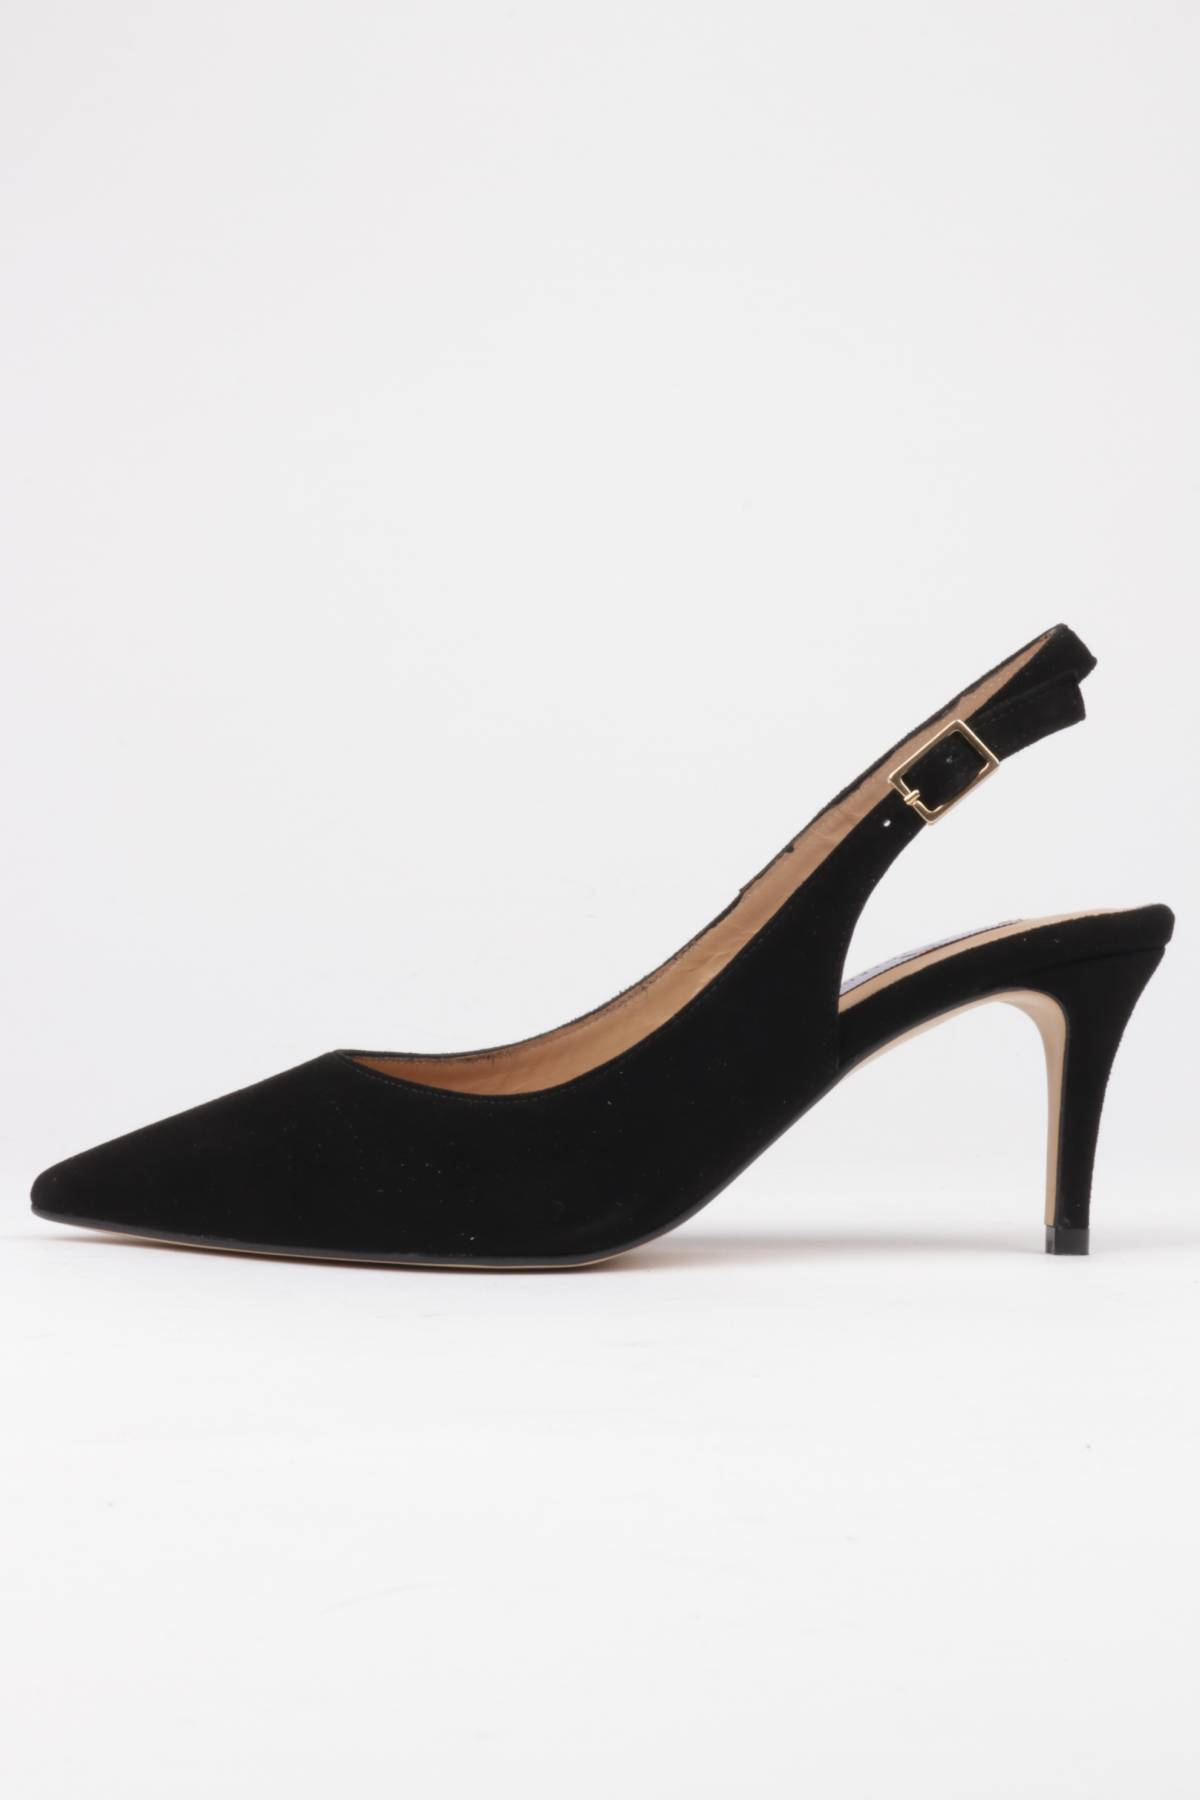 Slingback stilettos black suede mid heel